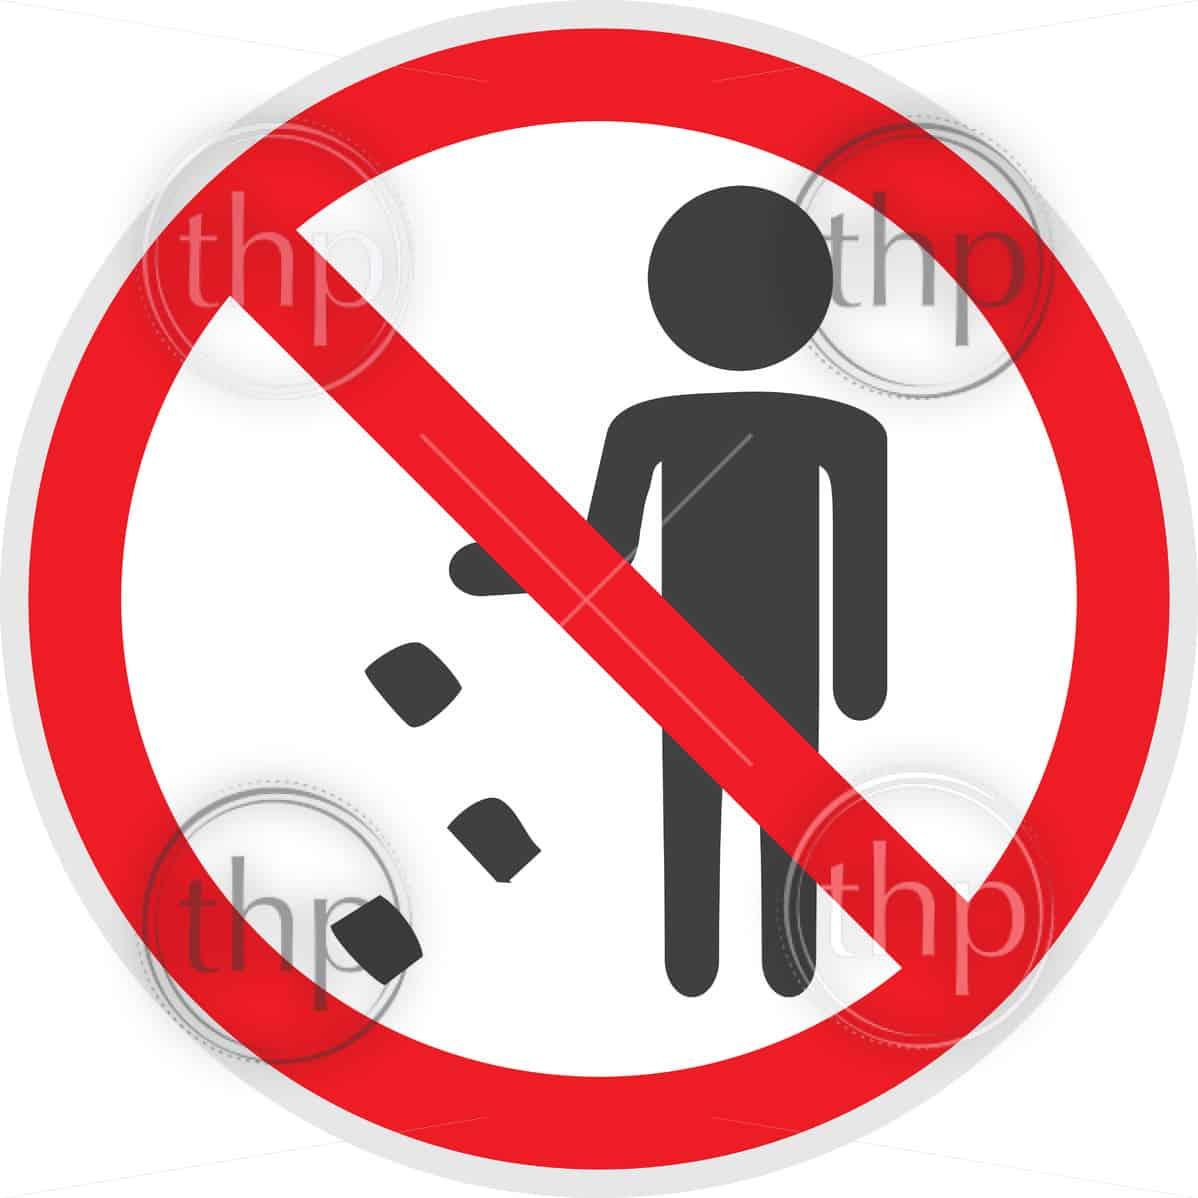 No littering sign in vector depicting banned activities